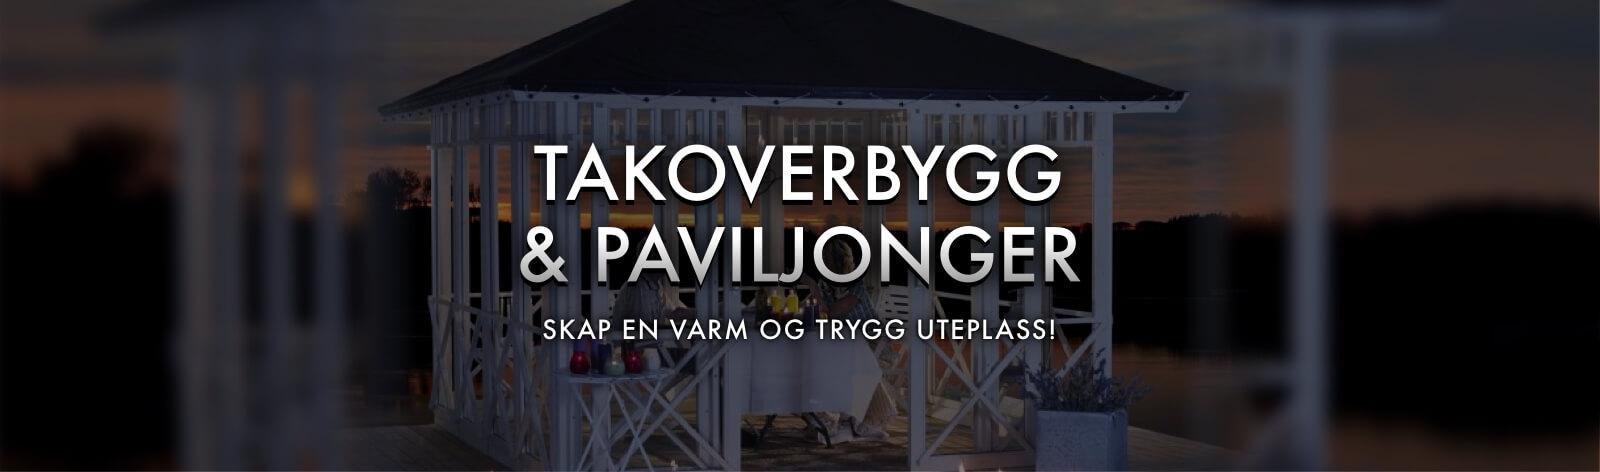 TAKOVERBYGG & PAVILJONG